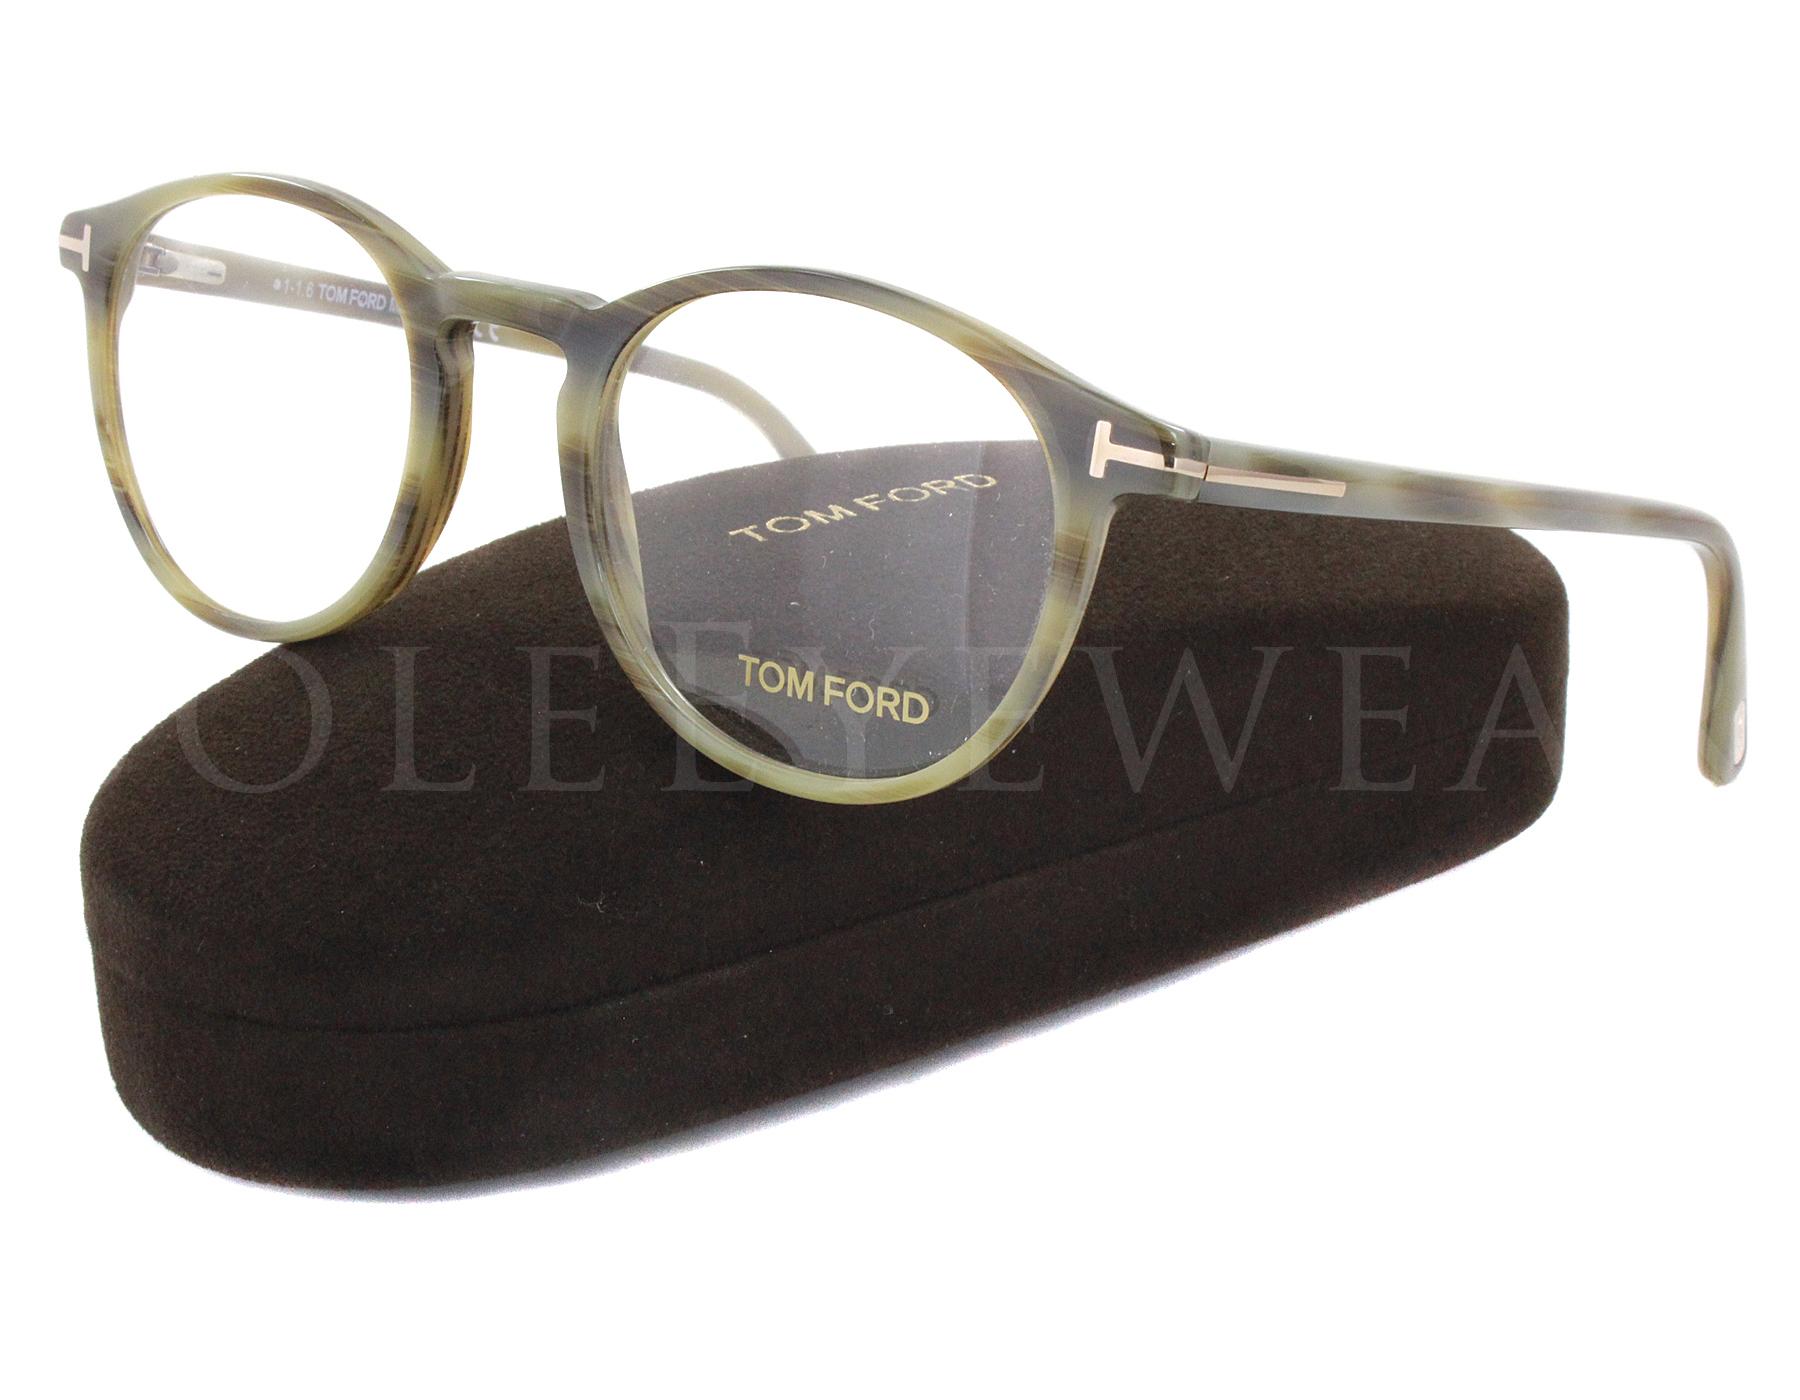 0712d4194f Details about NEW Tom Ford FT5294 0064 48mm Green Horn Optical Eyeglasses  Frames